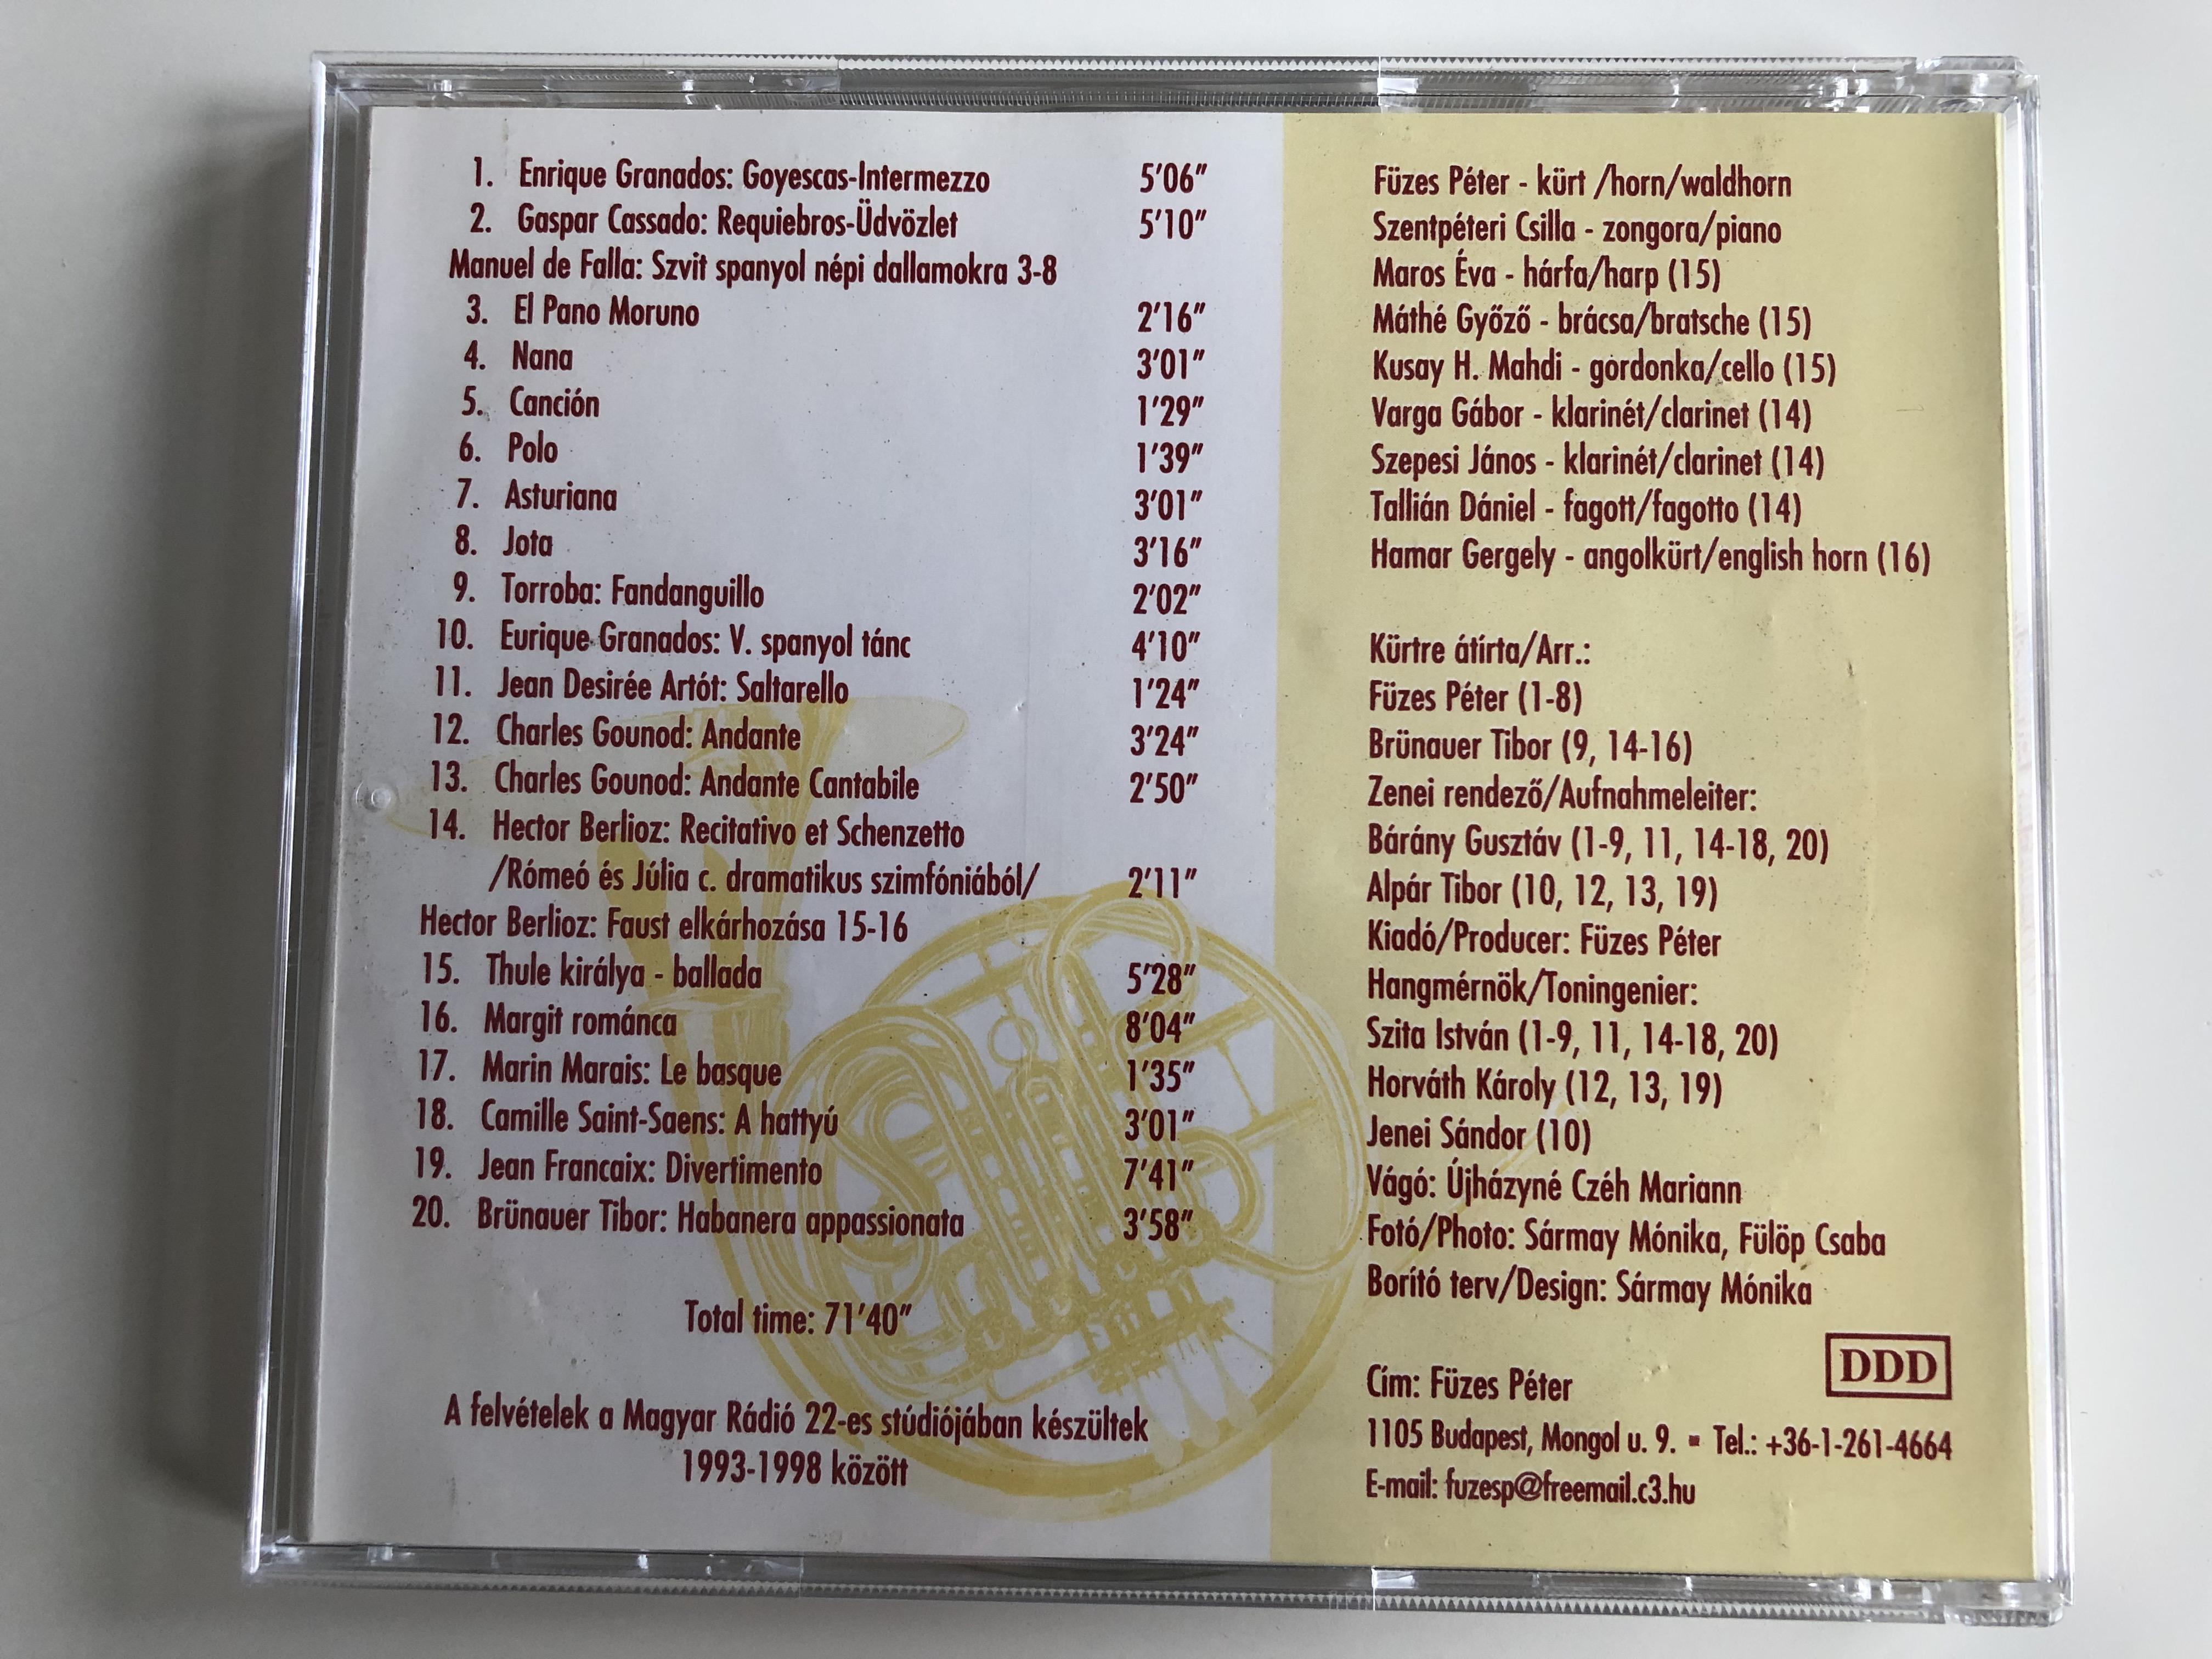 romantikus-k-rtmuzsika-romantic-music-for-horn-f-zes-p-ter-kurt-szentpetei-csilla-zongora-audio-cd-fp-001-7-.jpg